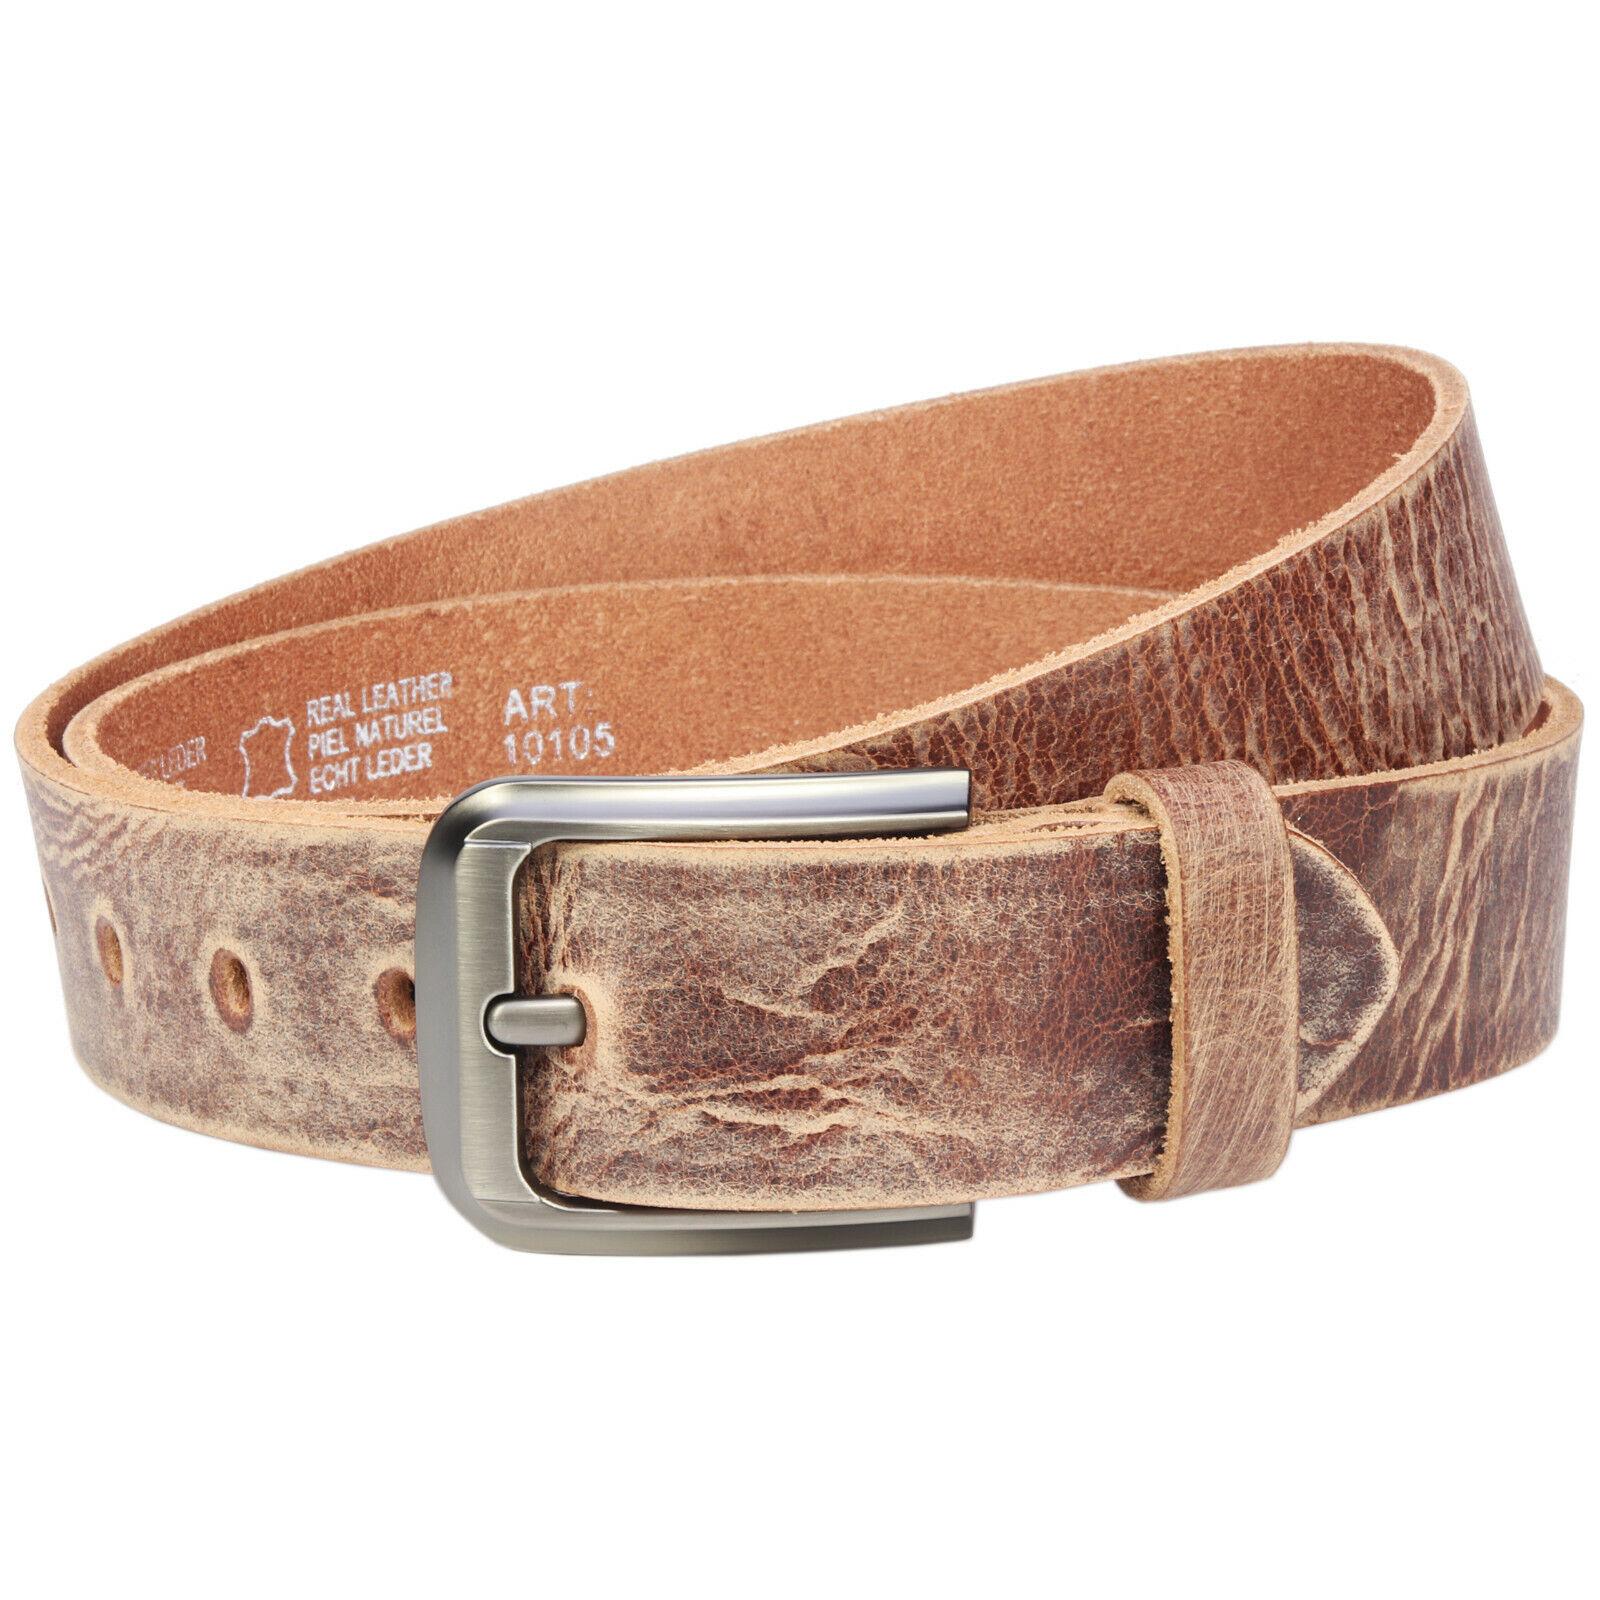 4cm echt Büffelleder Gürtel Braun Herren Jeans Leder Handgemacht 85cm-145 cm